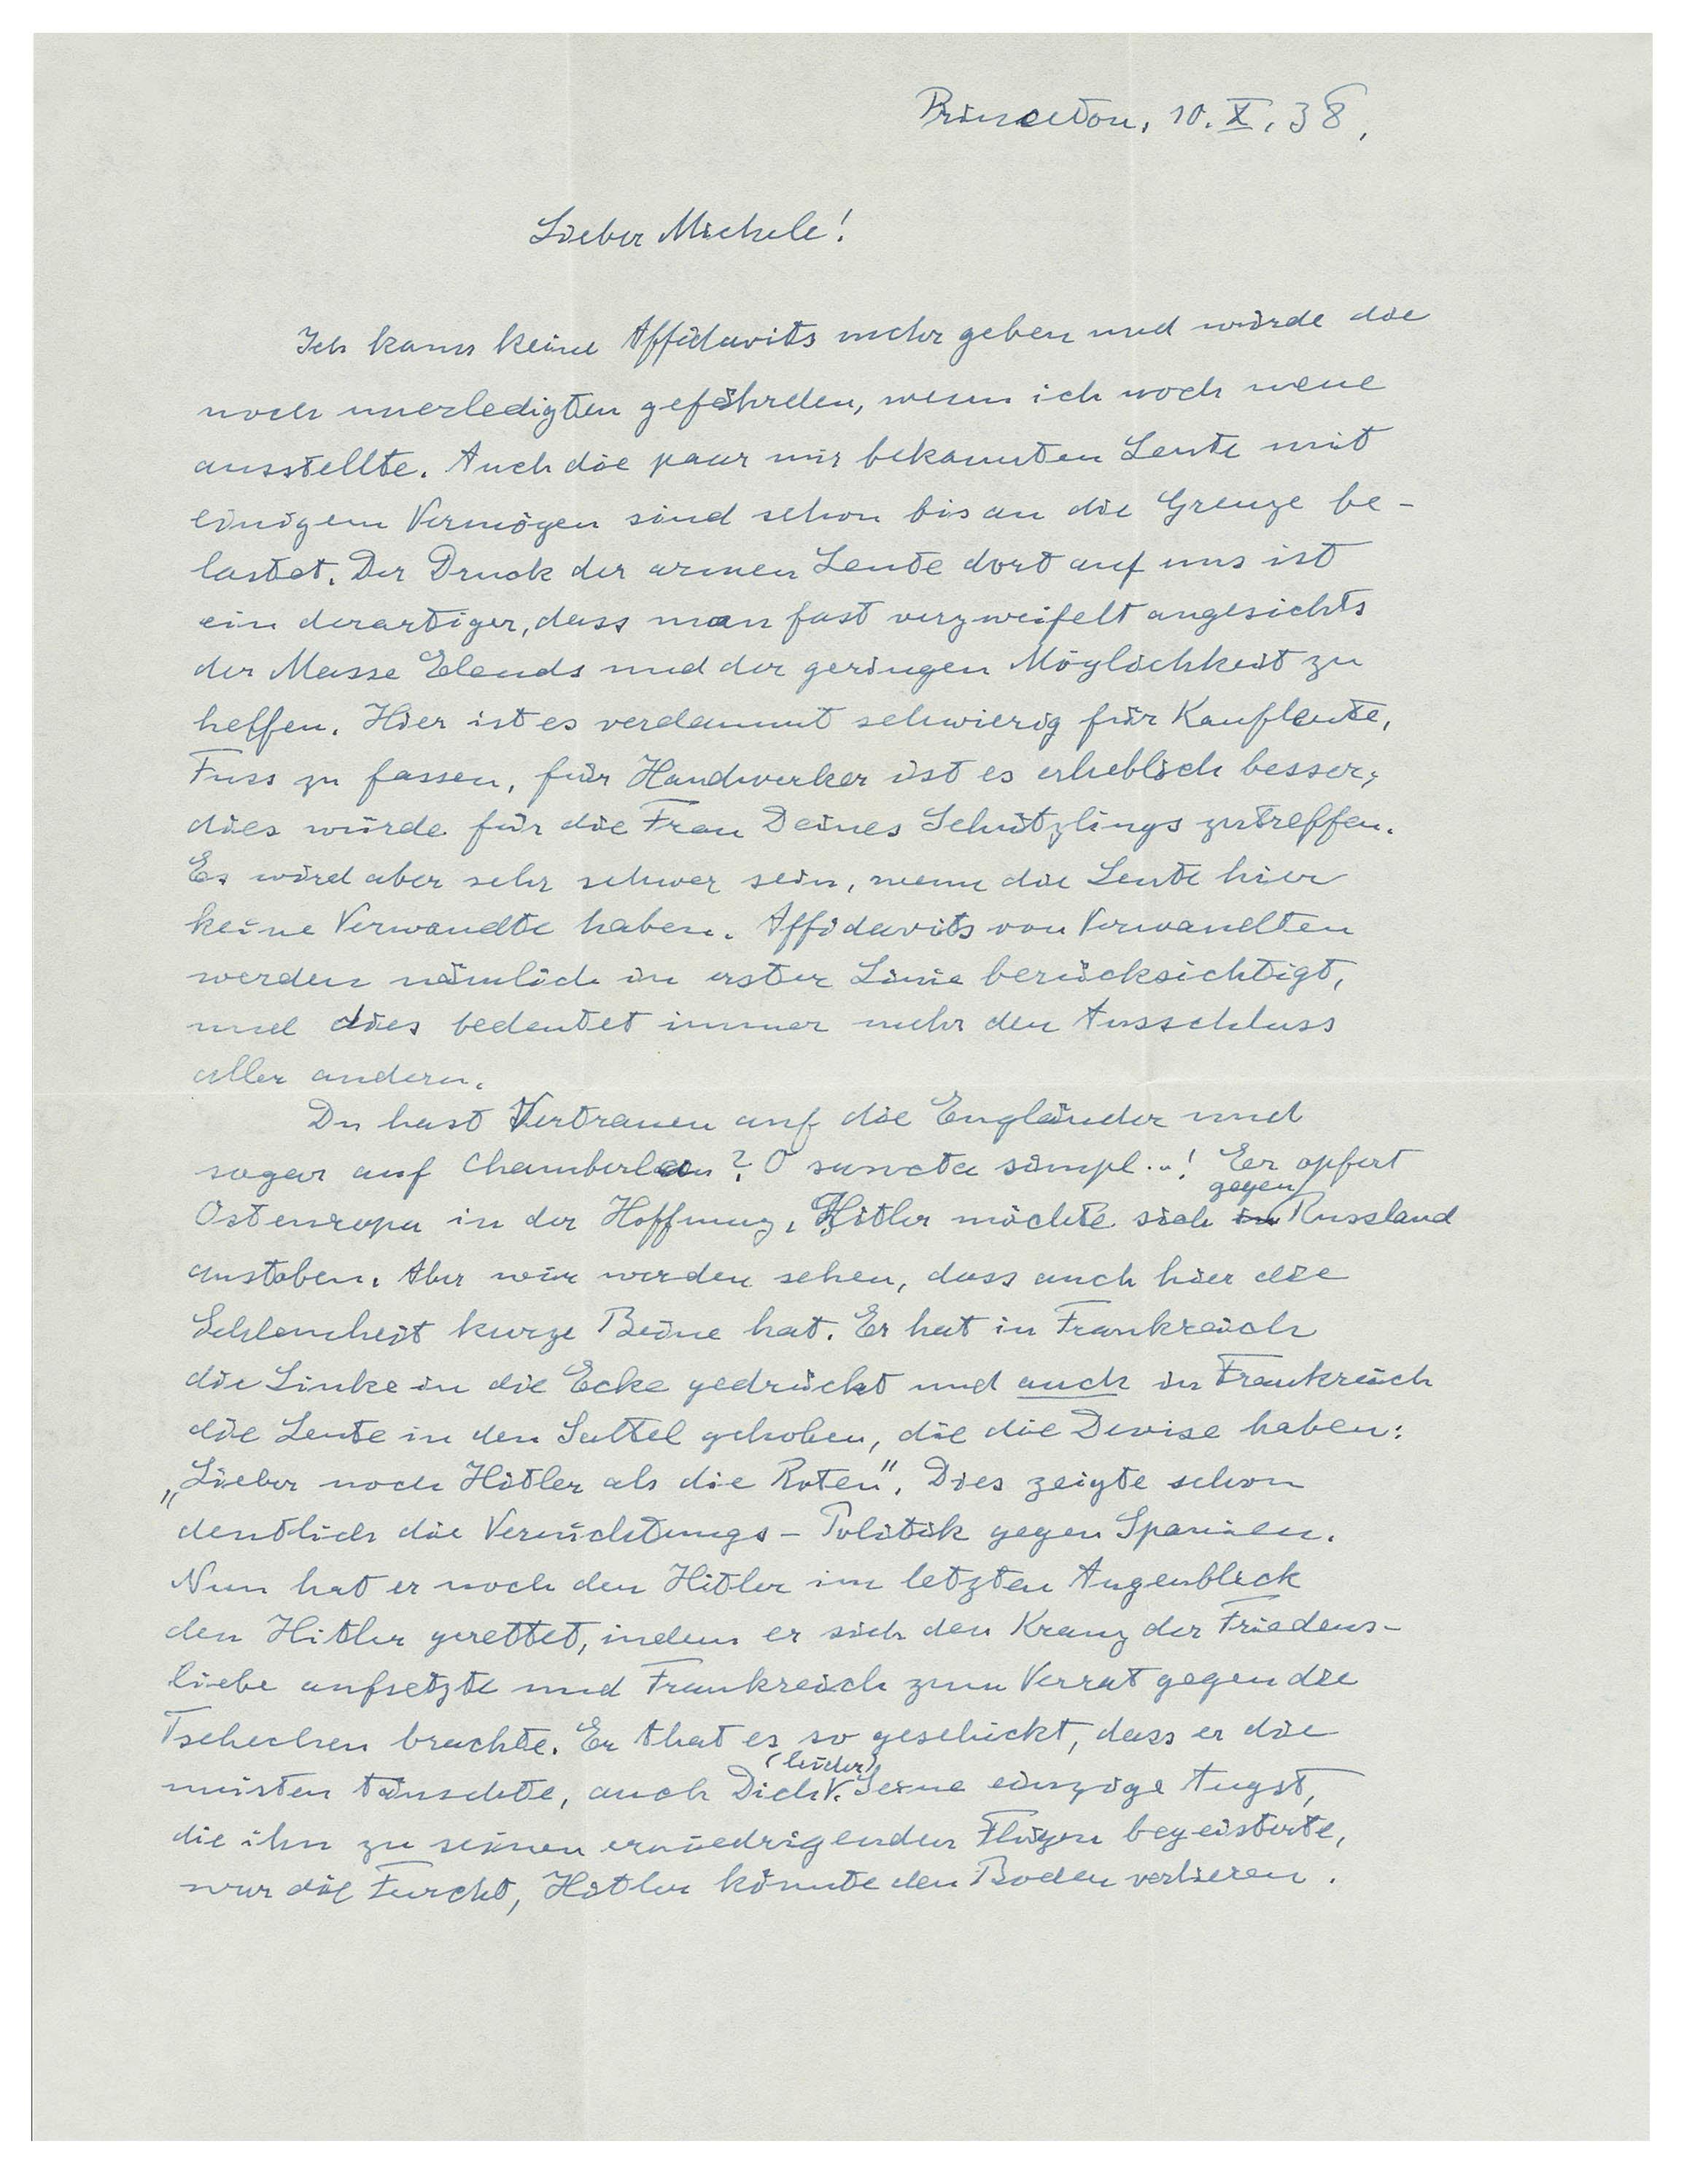 Einstein's Letter Criticizing PM Chamberlain's Attitude